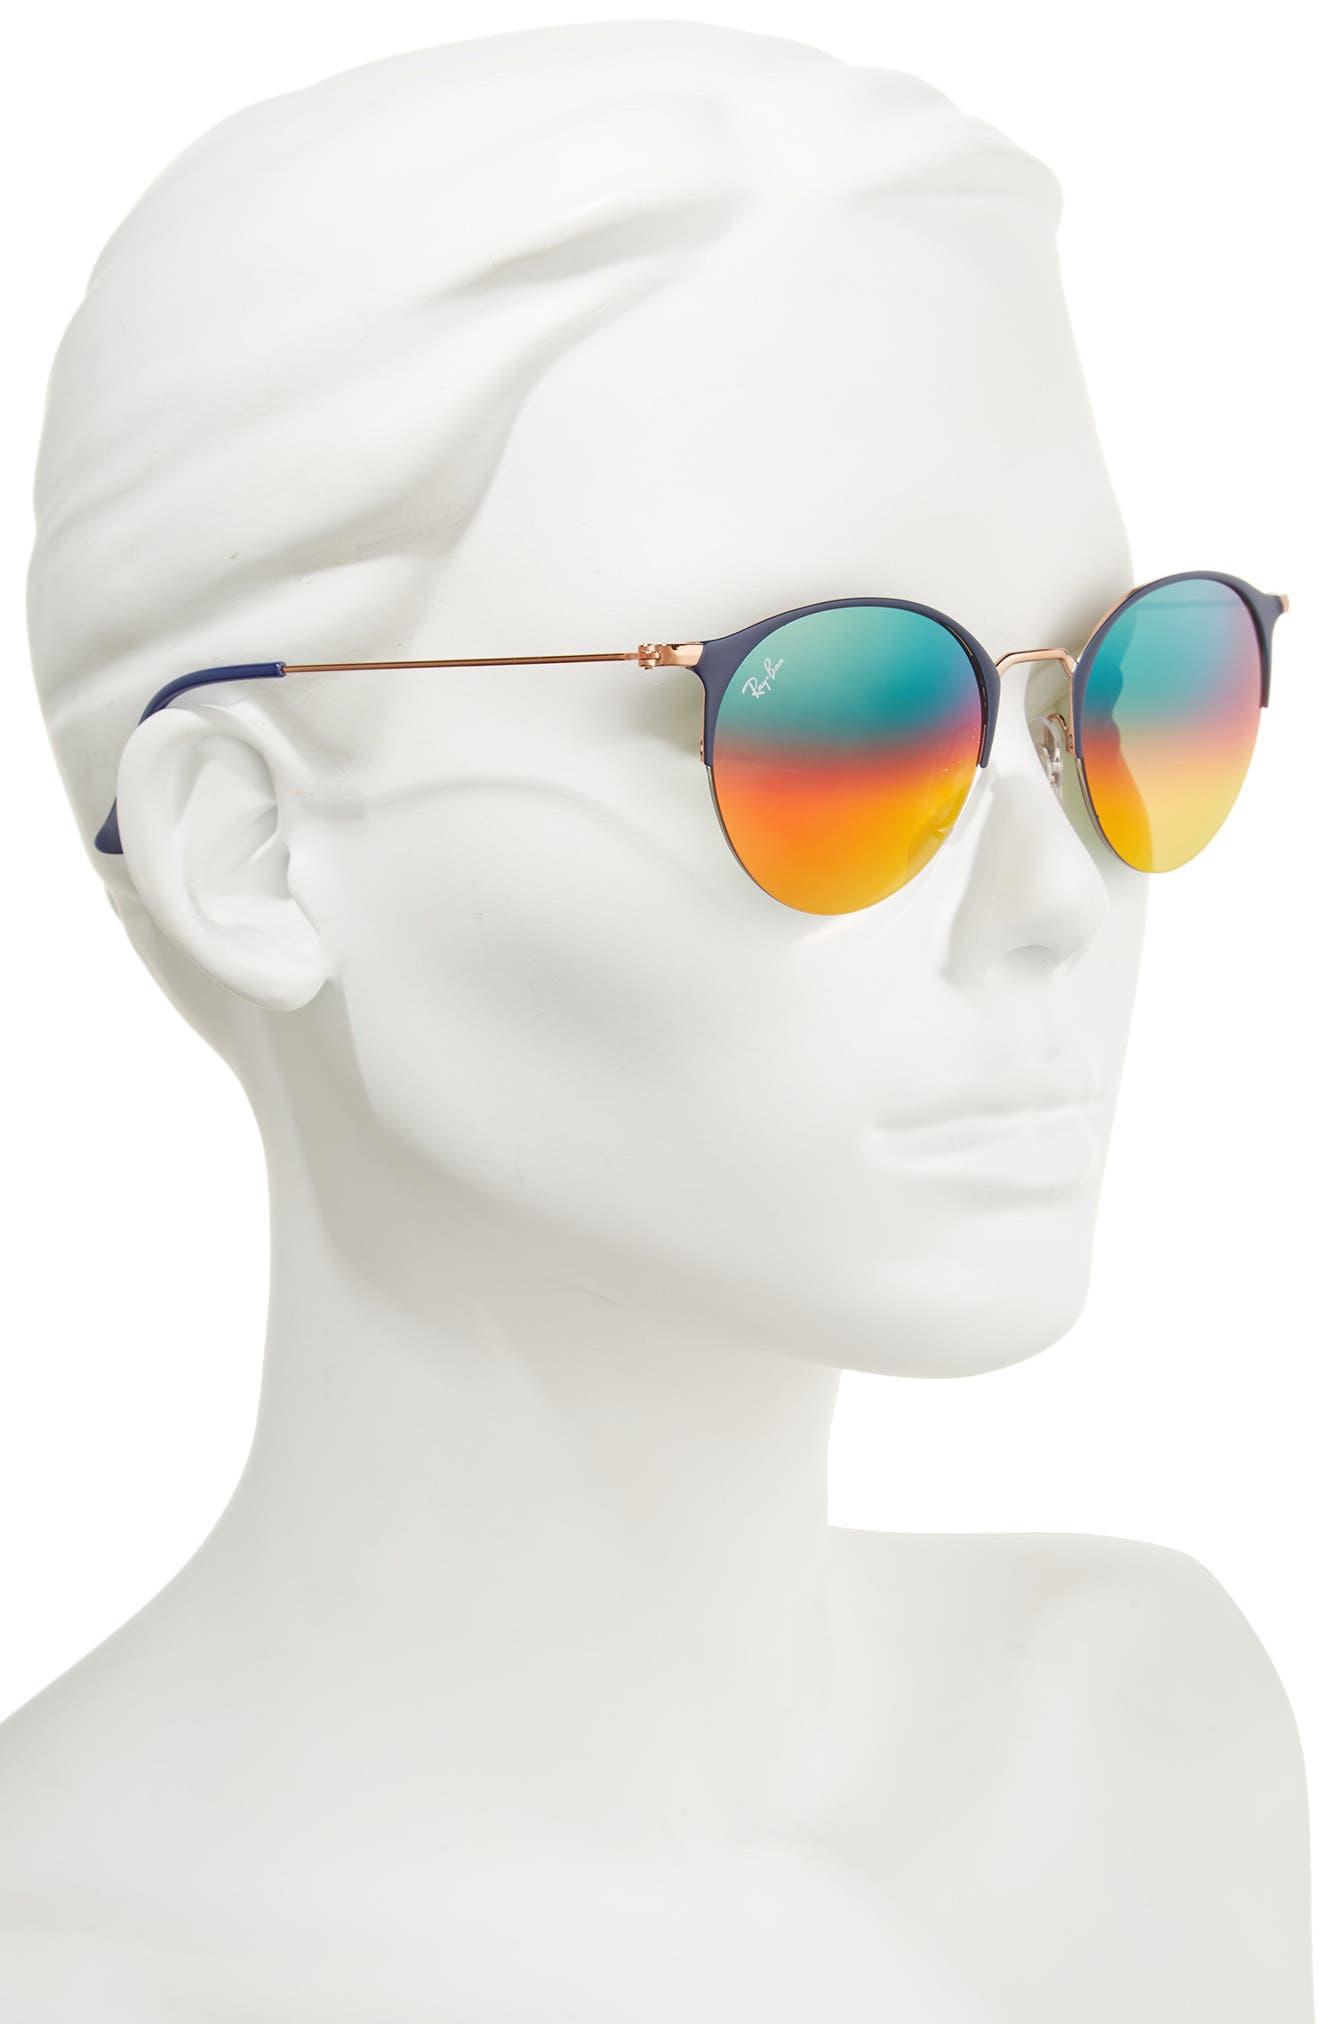 50mm Gradient Mirrored Sunglasses,                             Alternate thumbnail 4, color,